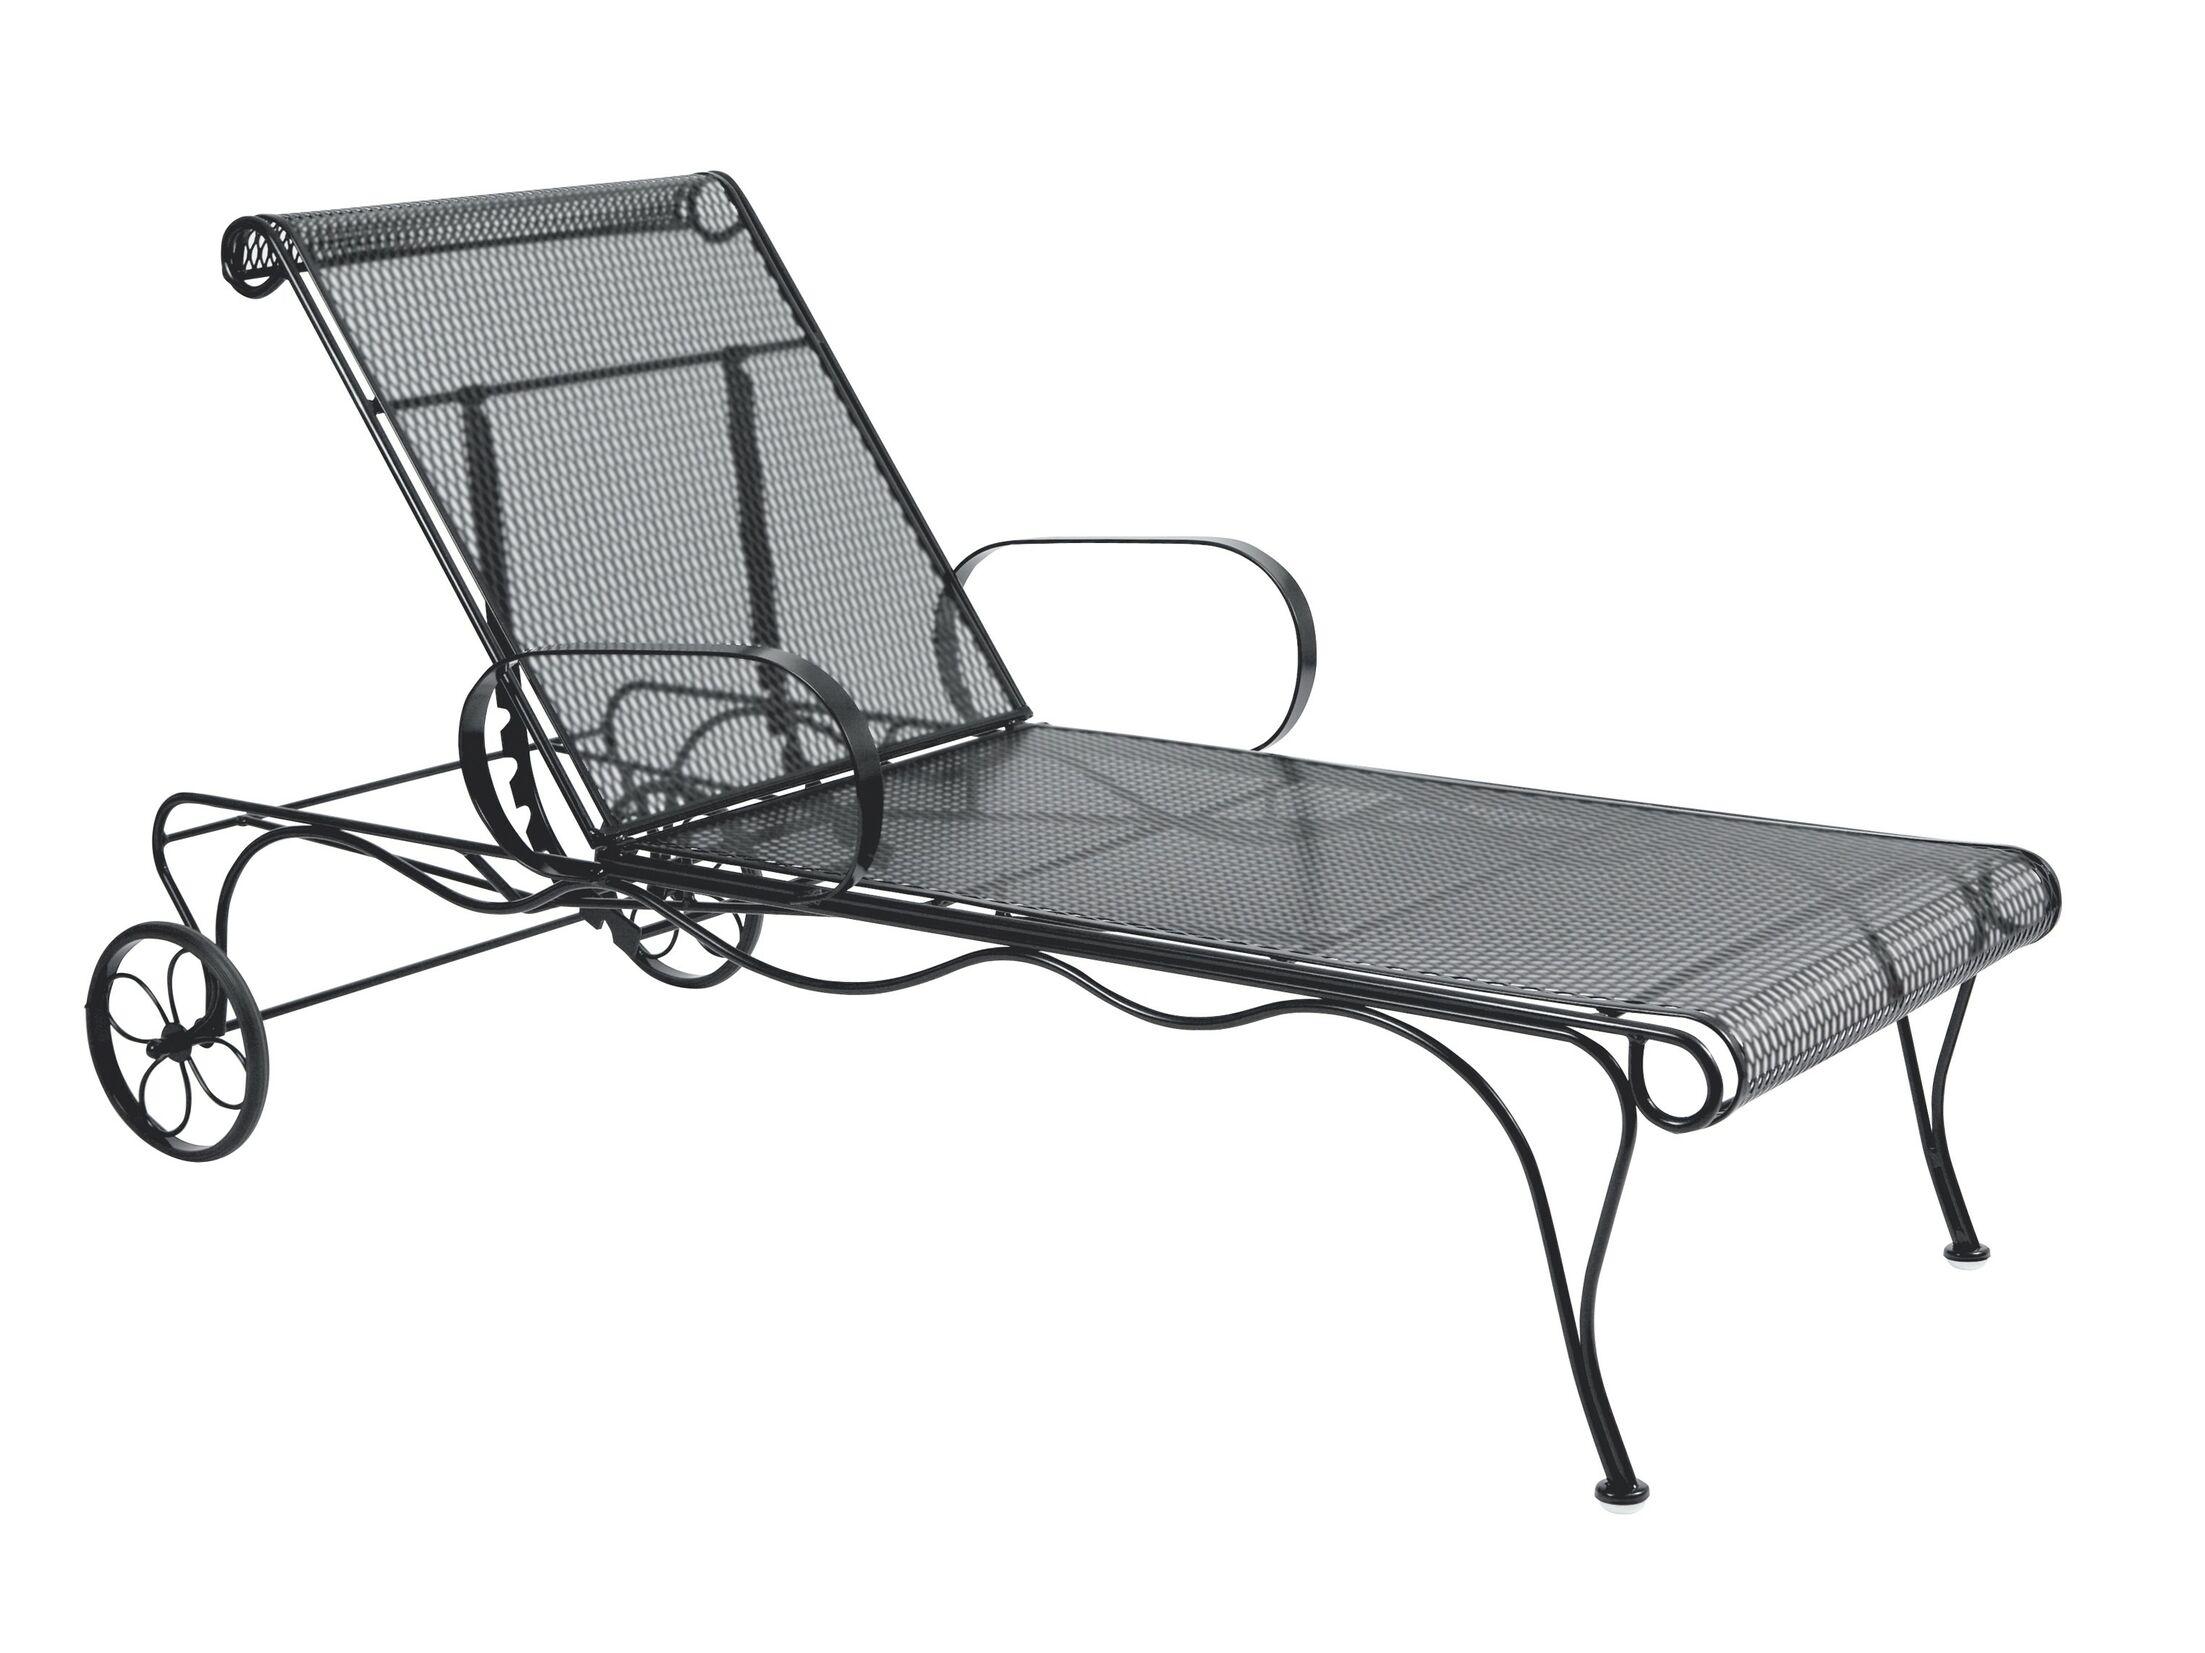 Tucson Adjustable Chaise Lounge Frame Color: Chestnut Brown